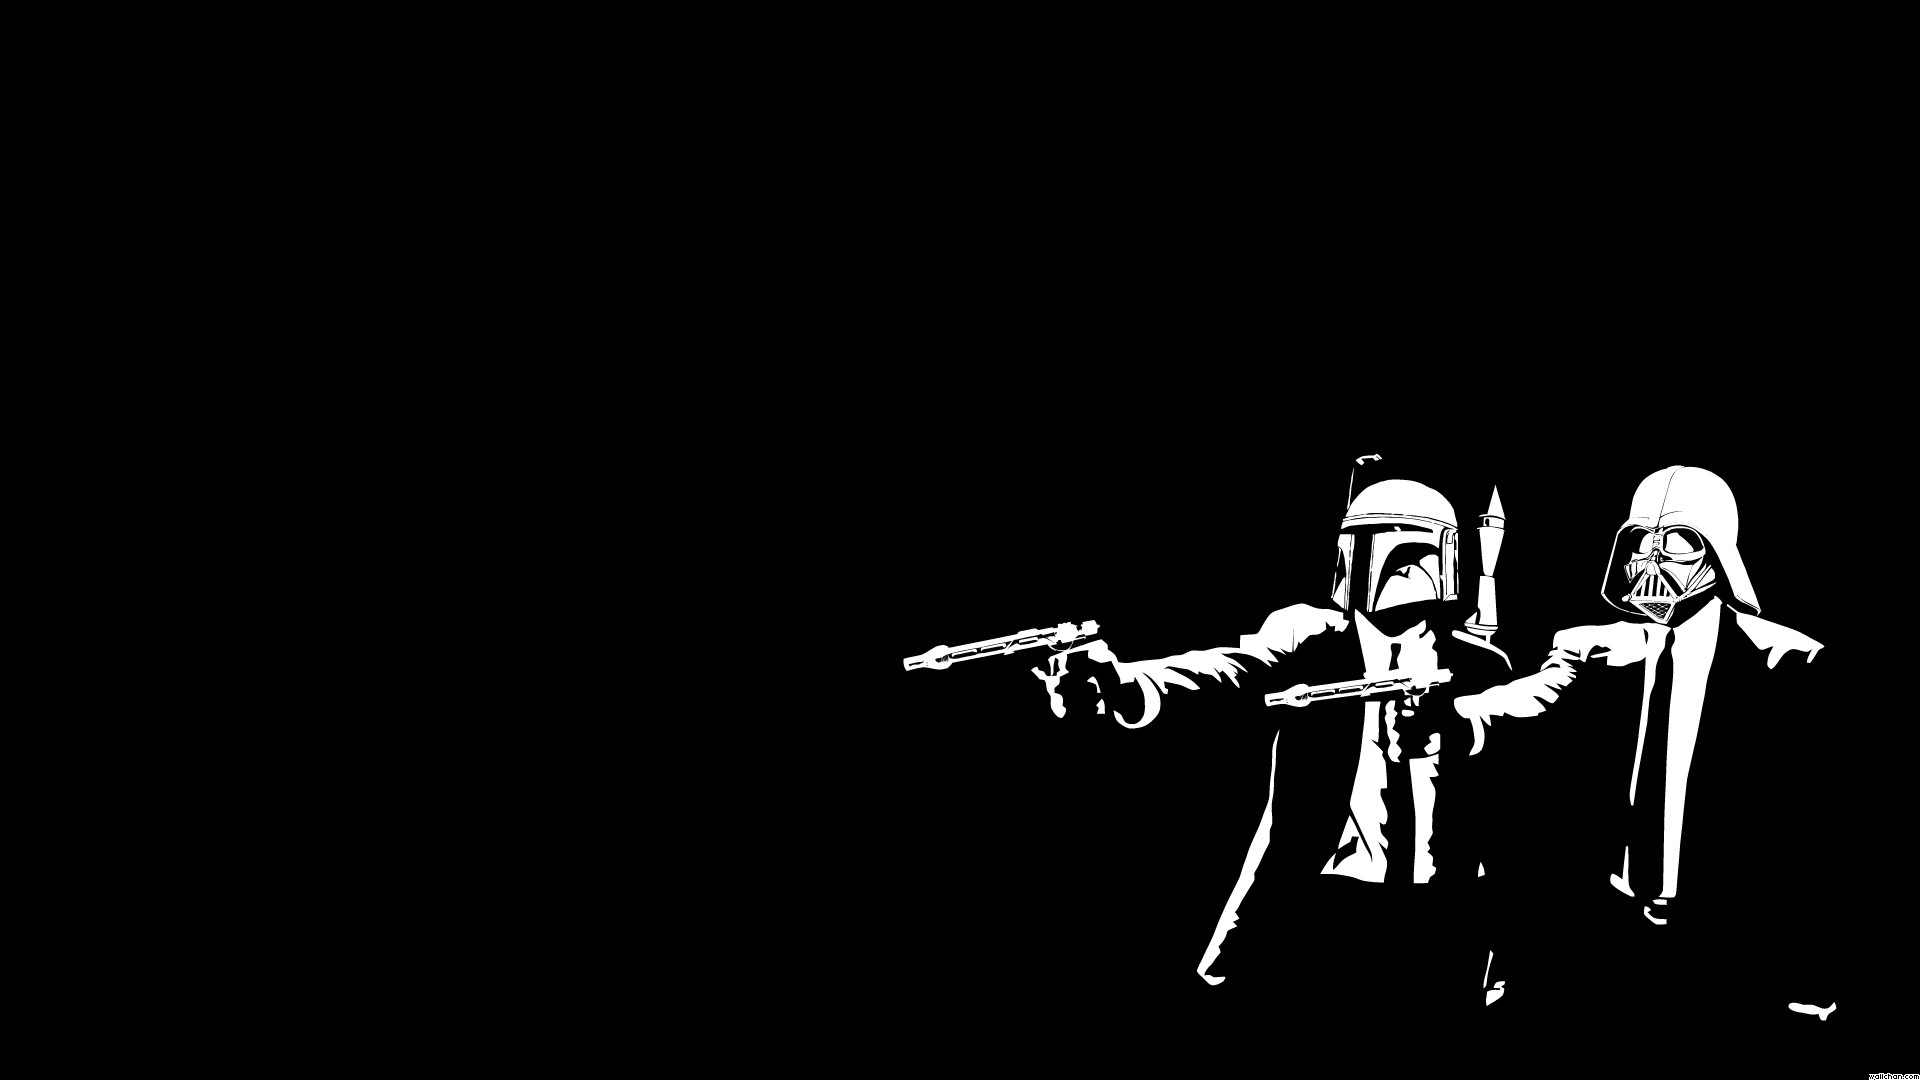 1920x1080 Cool Star Wars Wallpaper Download